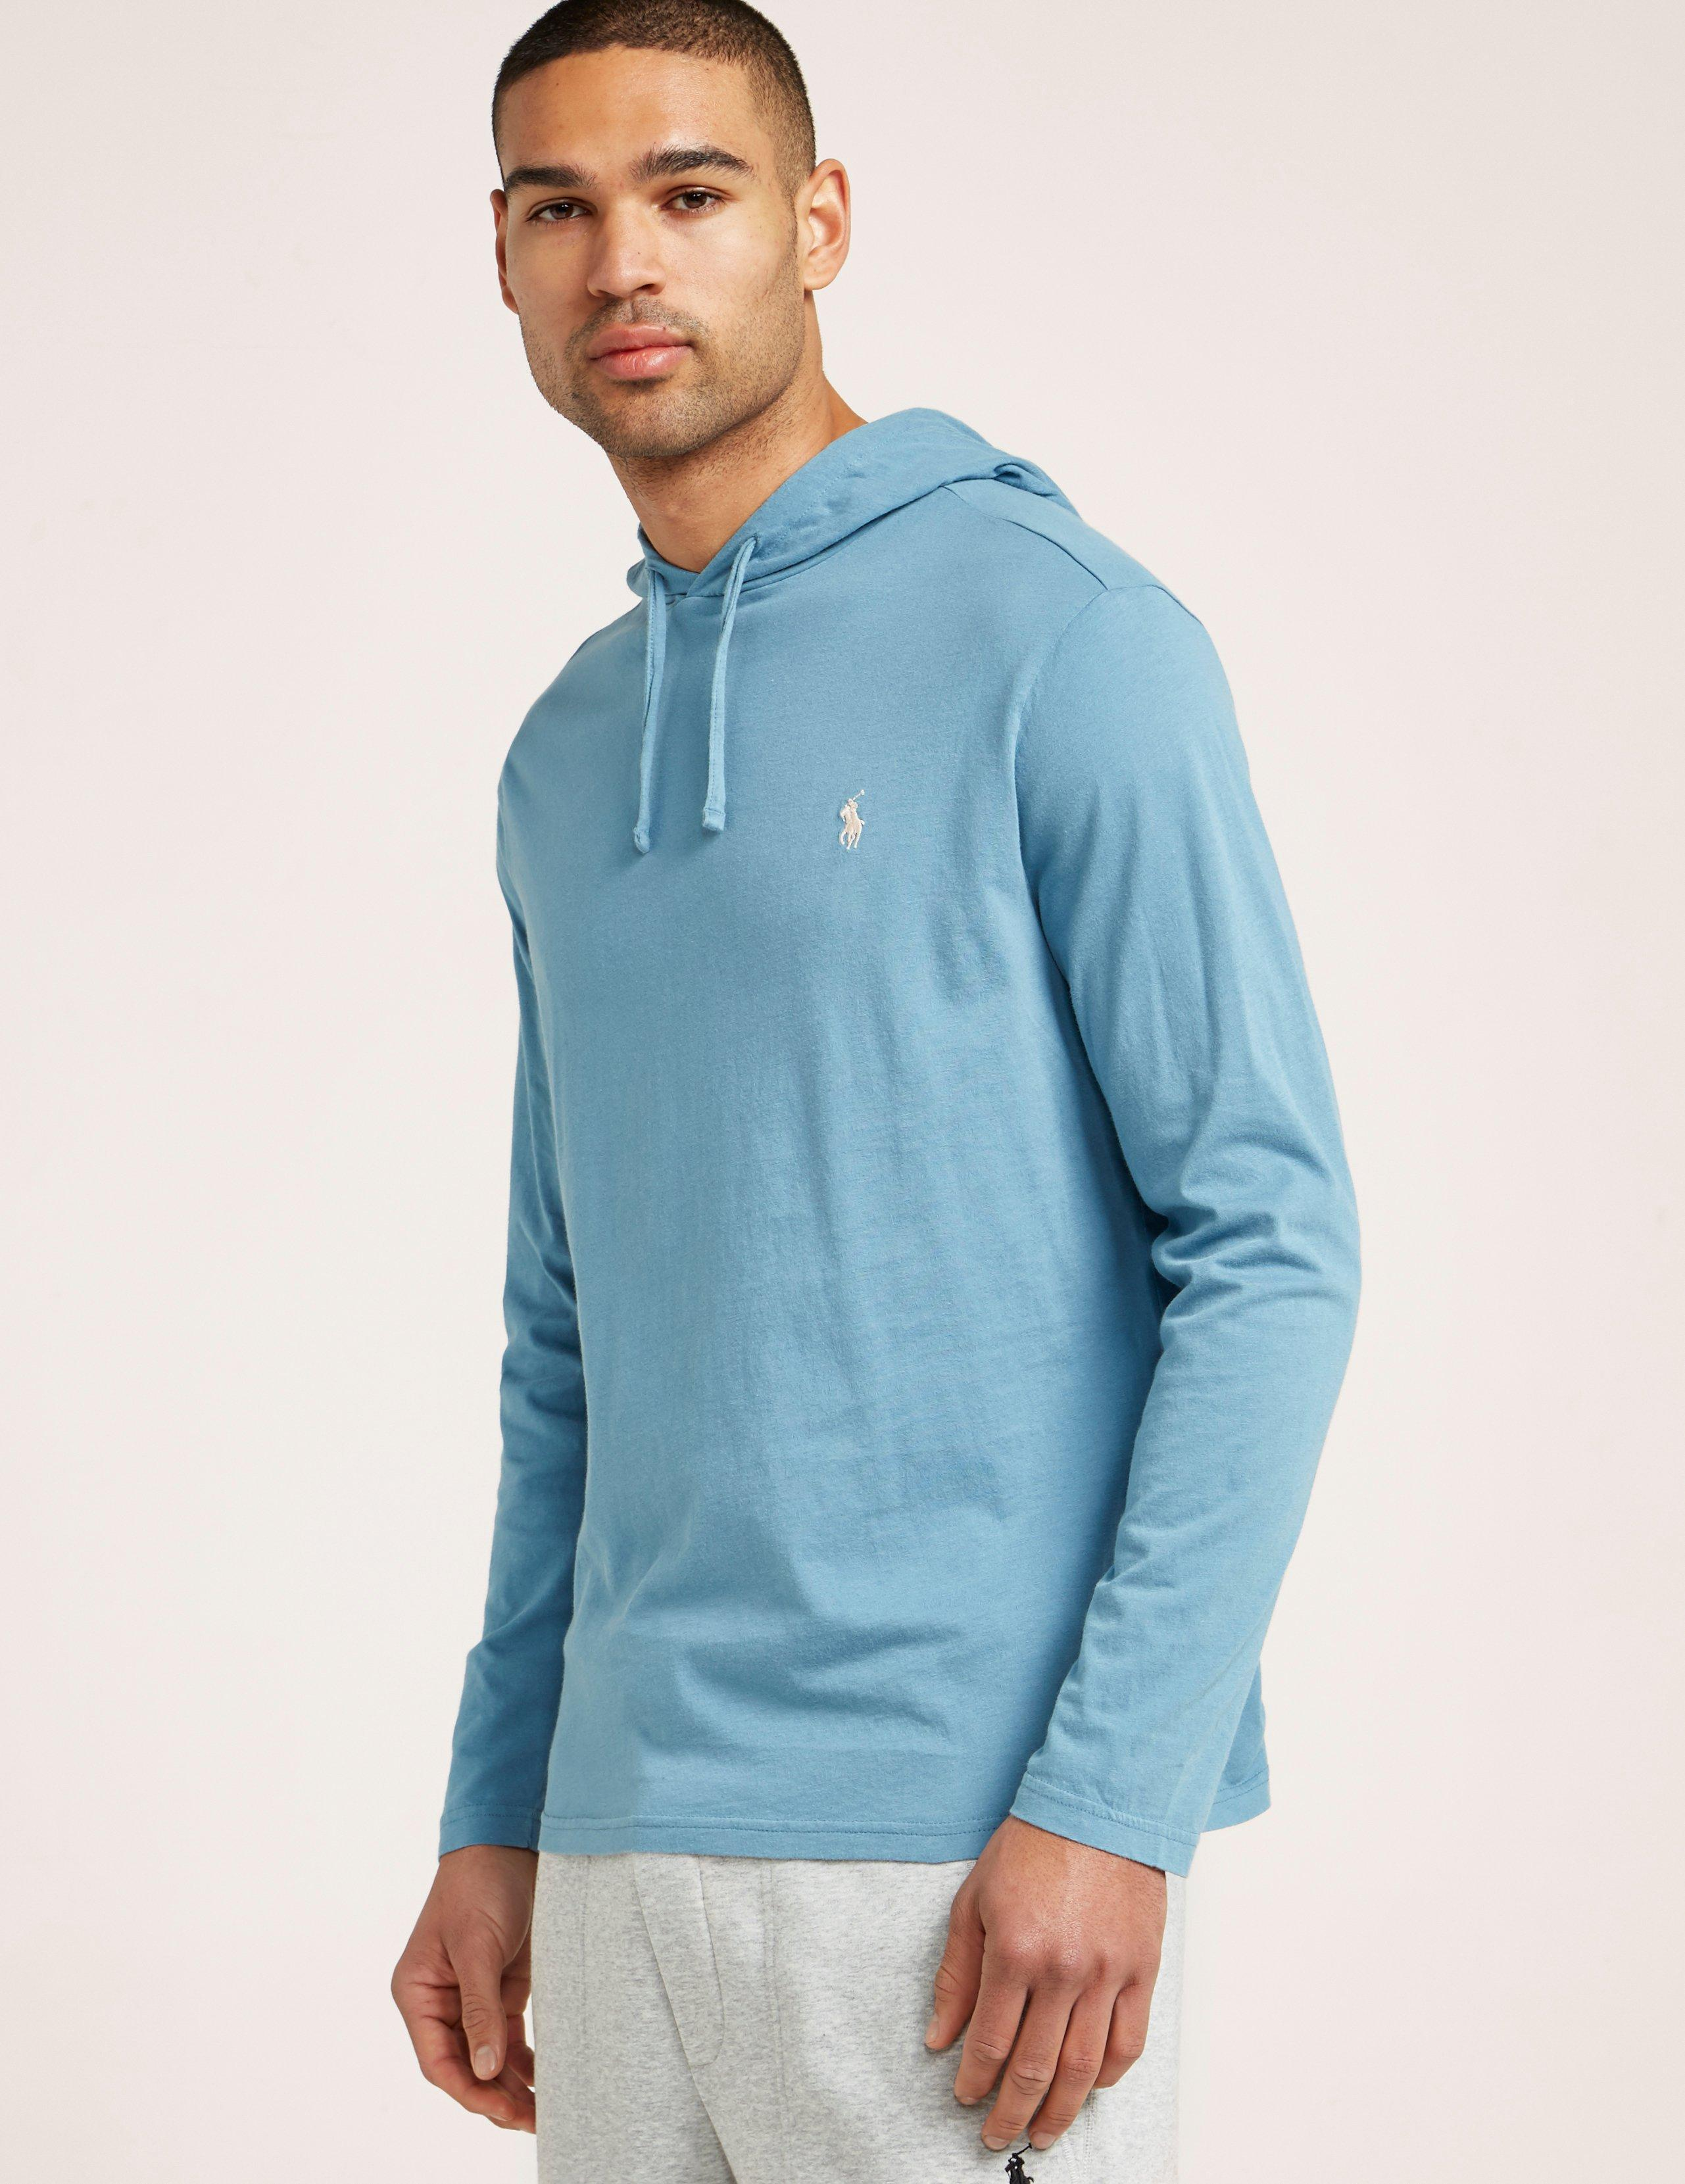 f037448c14271a Lyst - Polo Ralph Lauren Long Sleeve Hooded T-shirt in Blue for Men